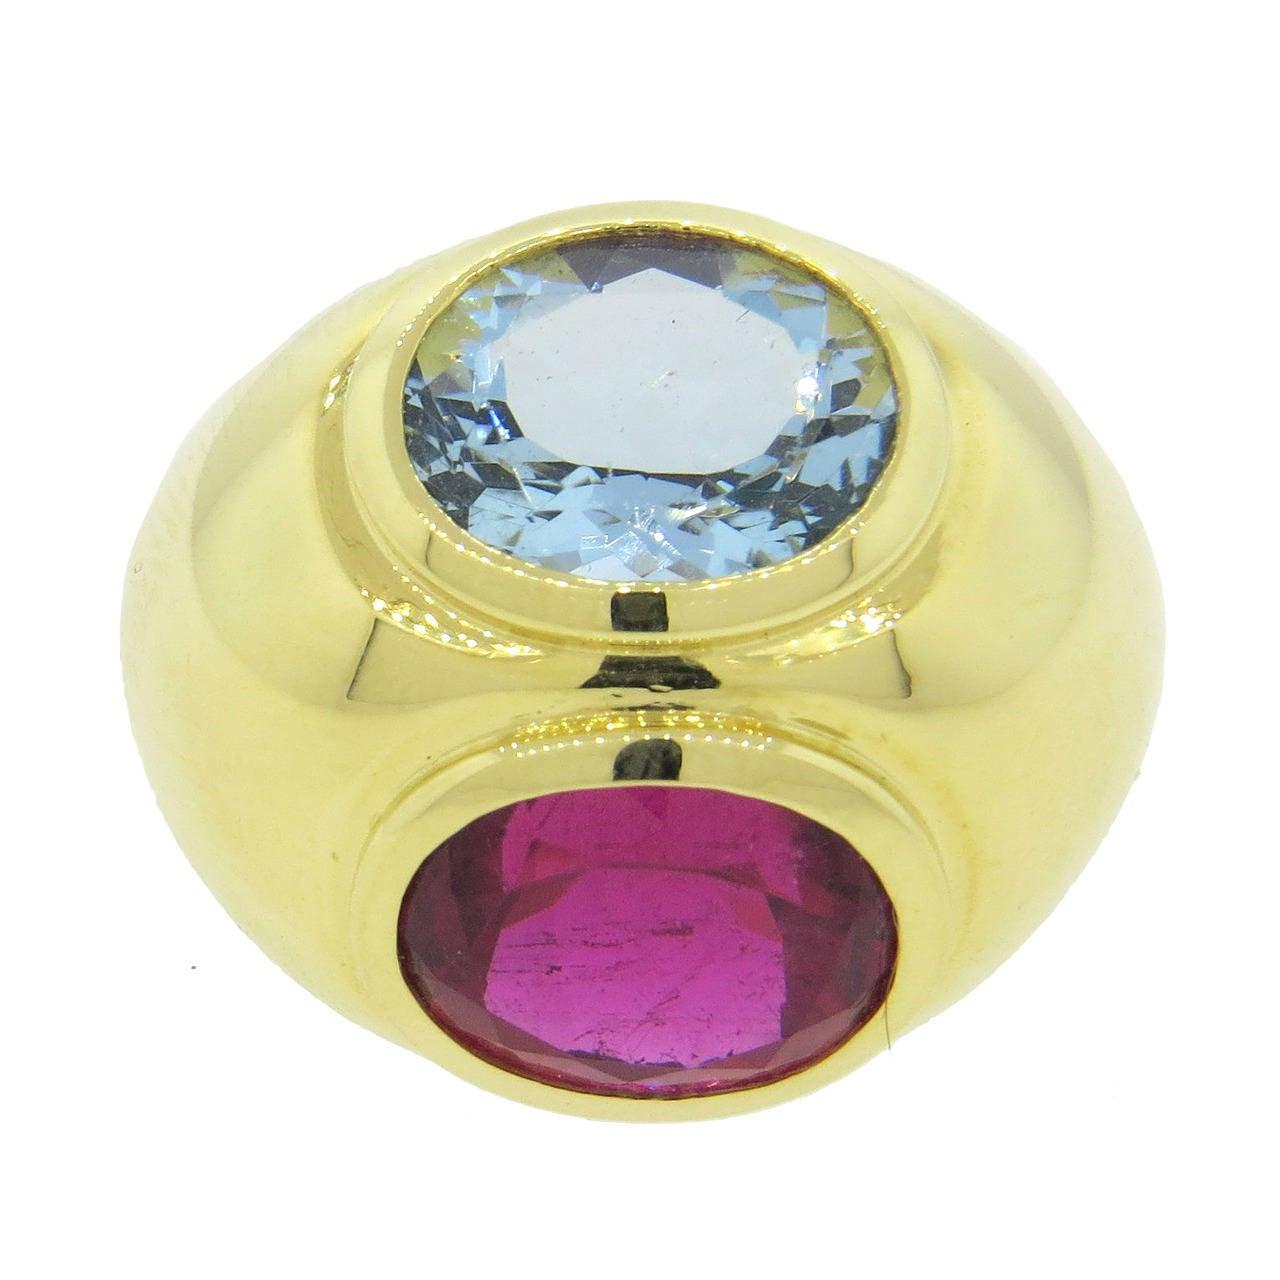 a62f37339 Tiffany & Co. Paloma Picasso Rubellite Tourmaline Aquamarine Gold Dome Ring  For Sale